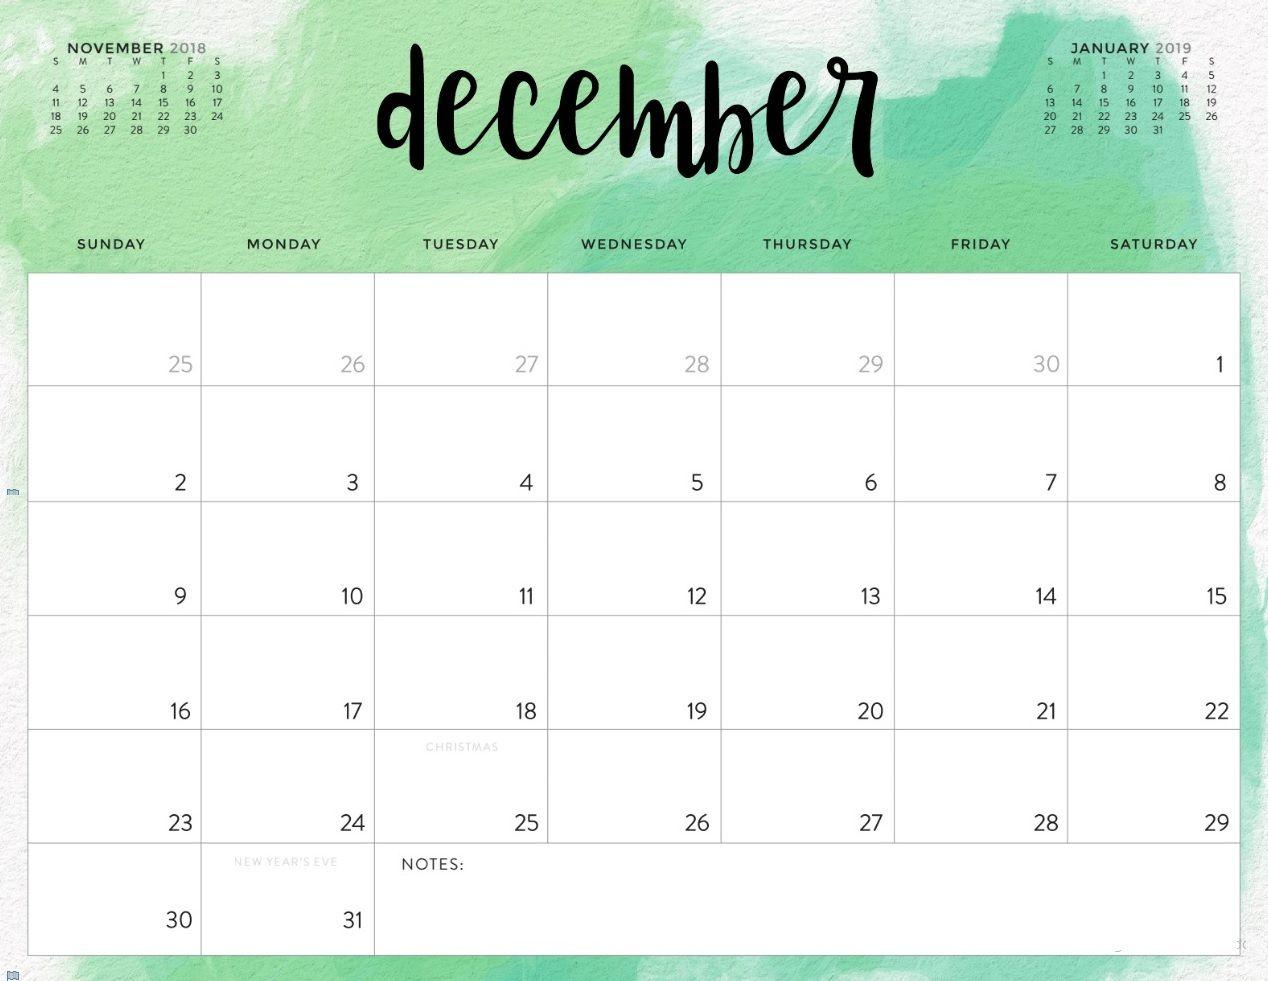 Free December 2018 Printable Calendar Blank Templates - Calendar intended for December Monthly Calendar Template